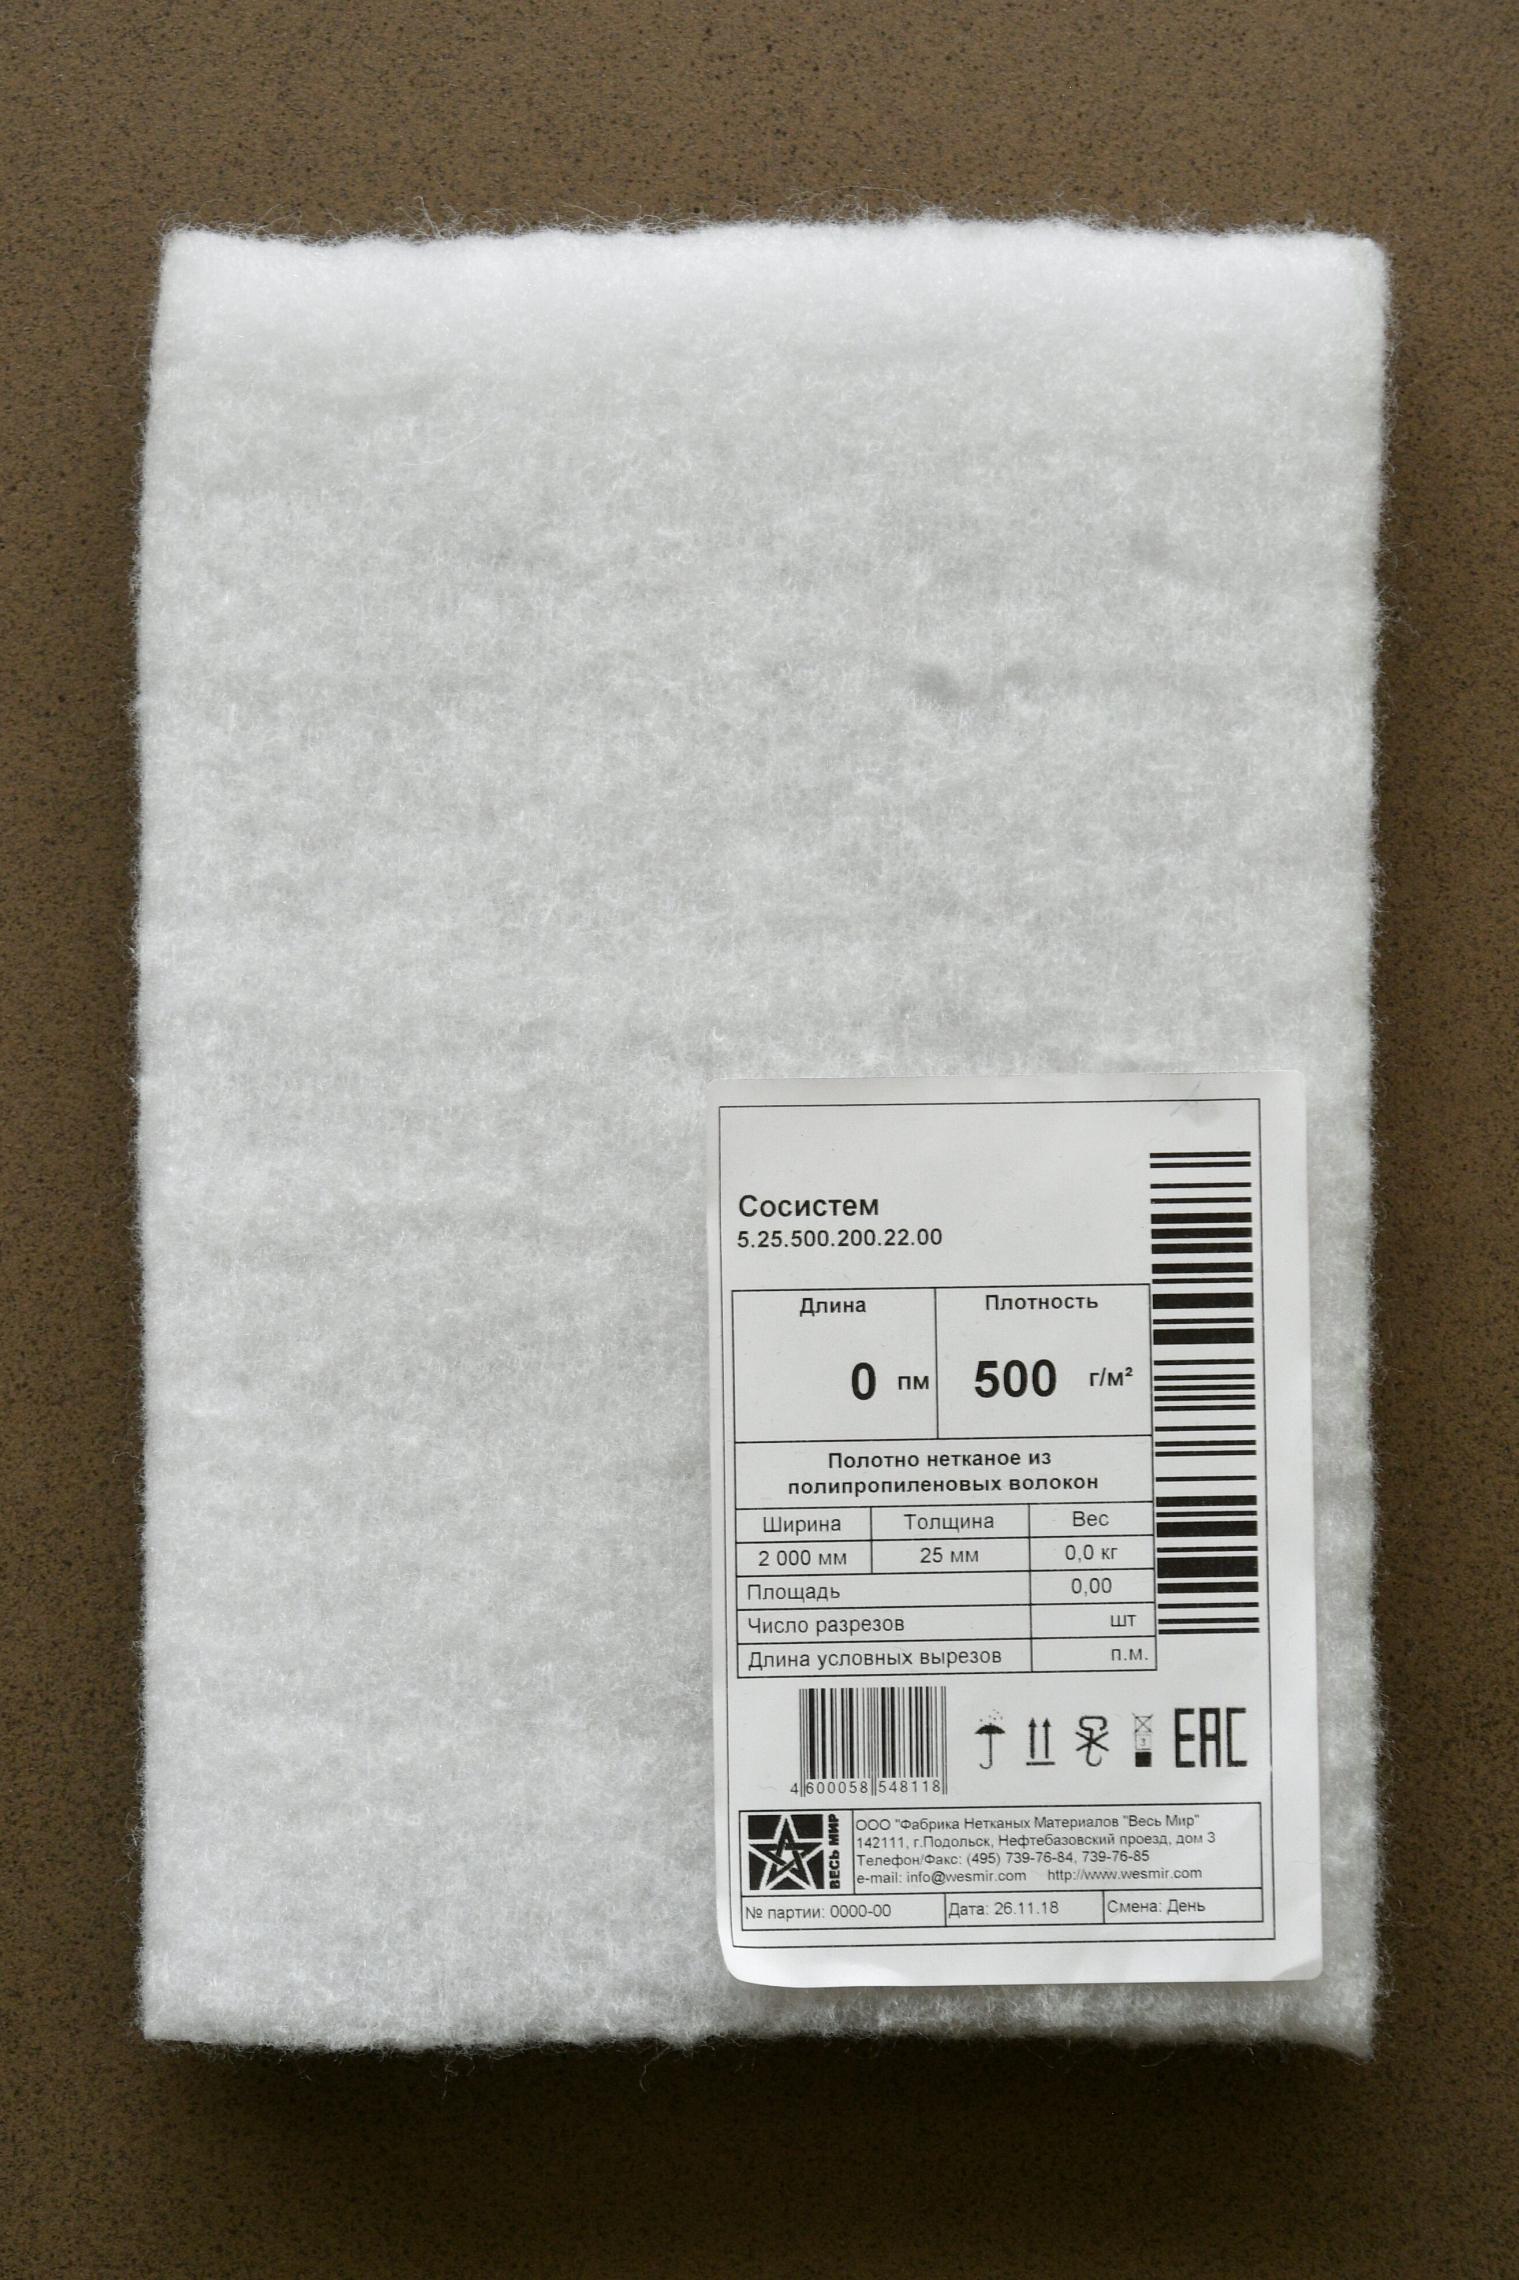 SoSystem® - 5.25.500.200.22.00